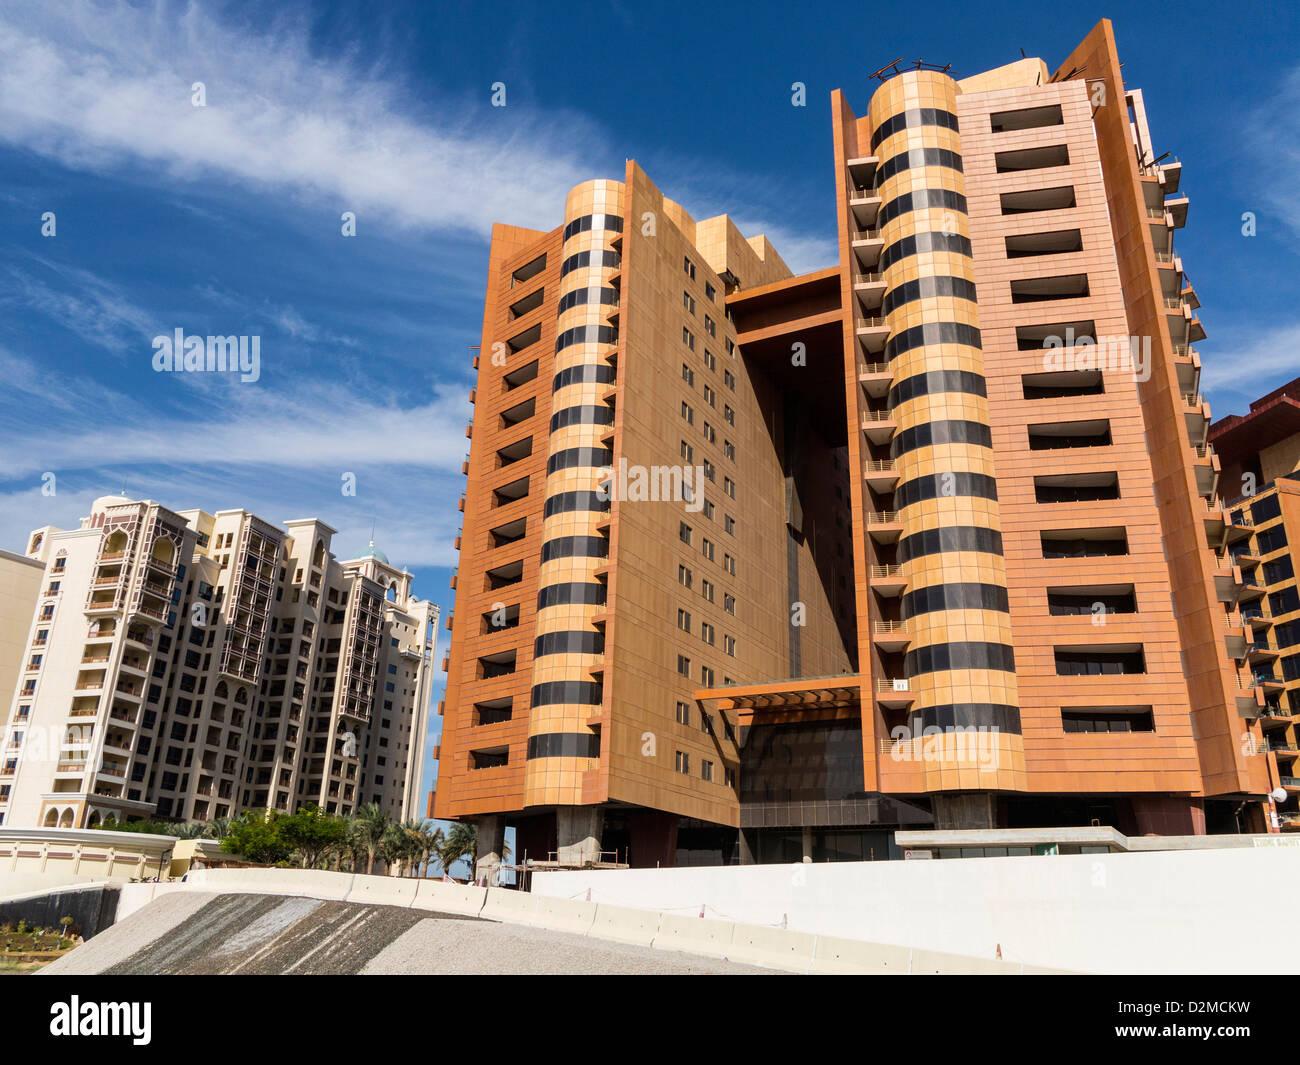 Modern architecture of tall residential buildings - Shoreline Apartments, Dubai, UAE - Stock Image